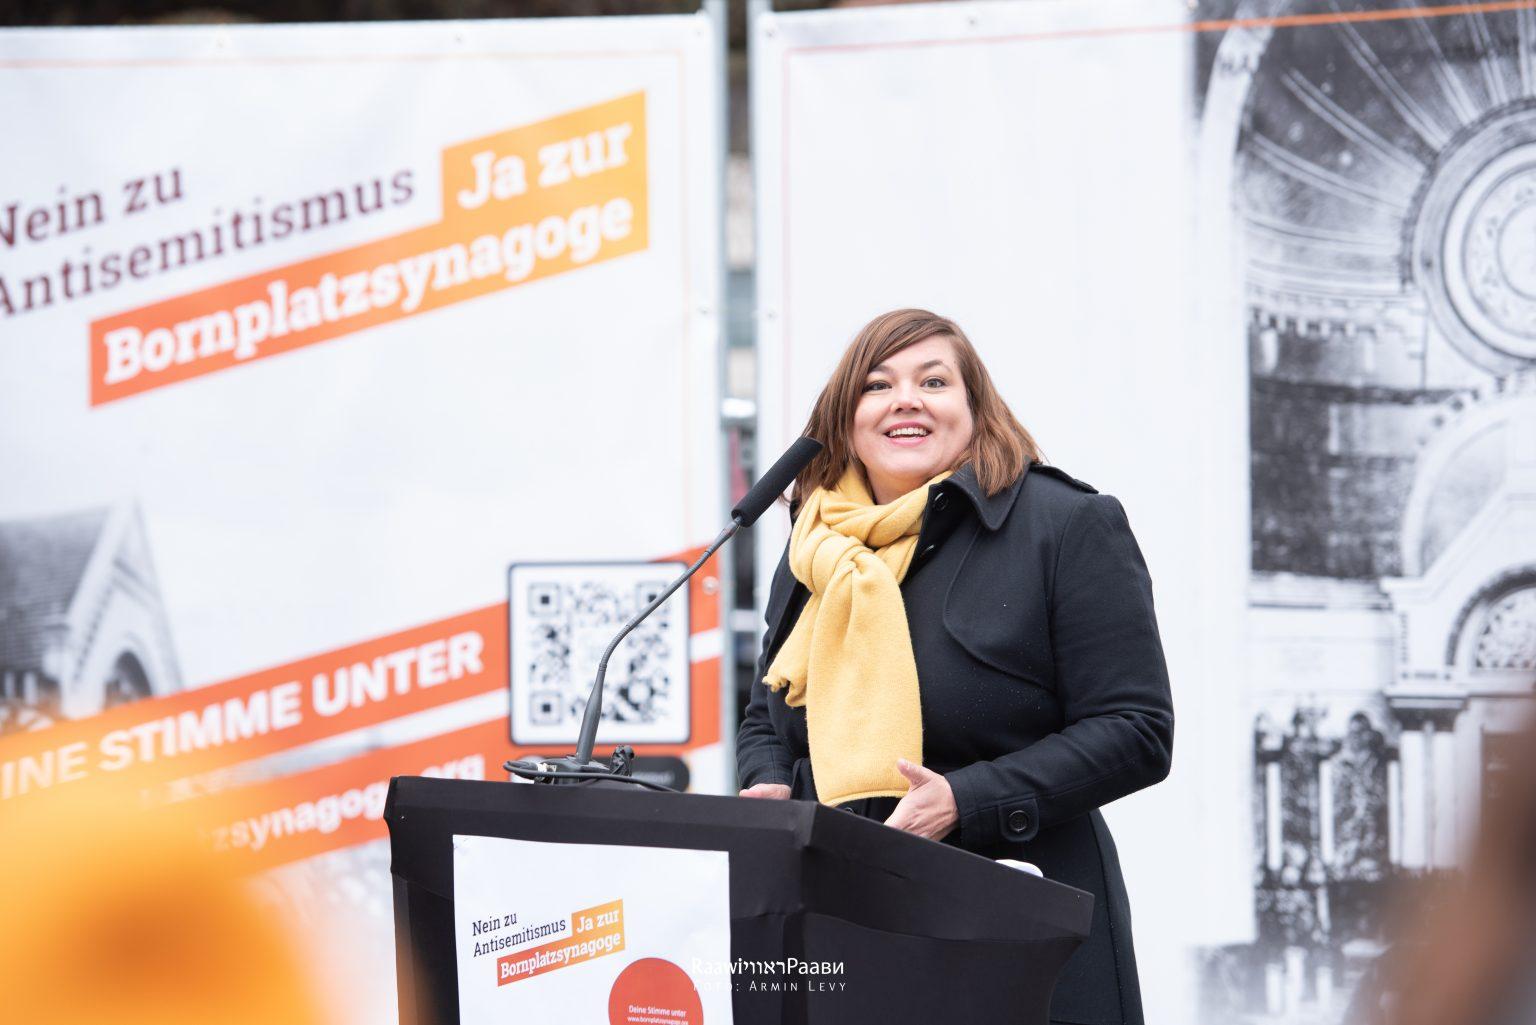 Ja zur Bornplatzsynagoge Katharina Fegebank